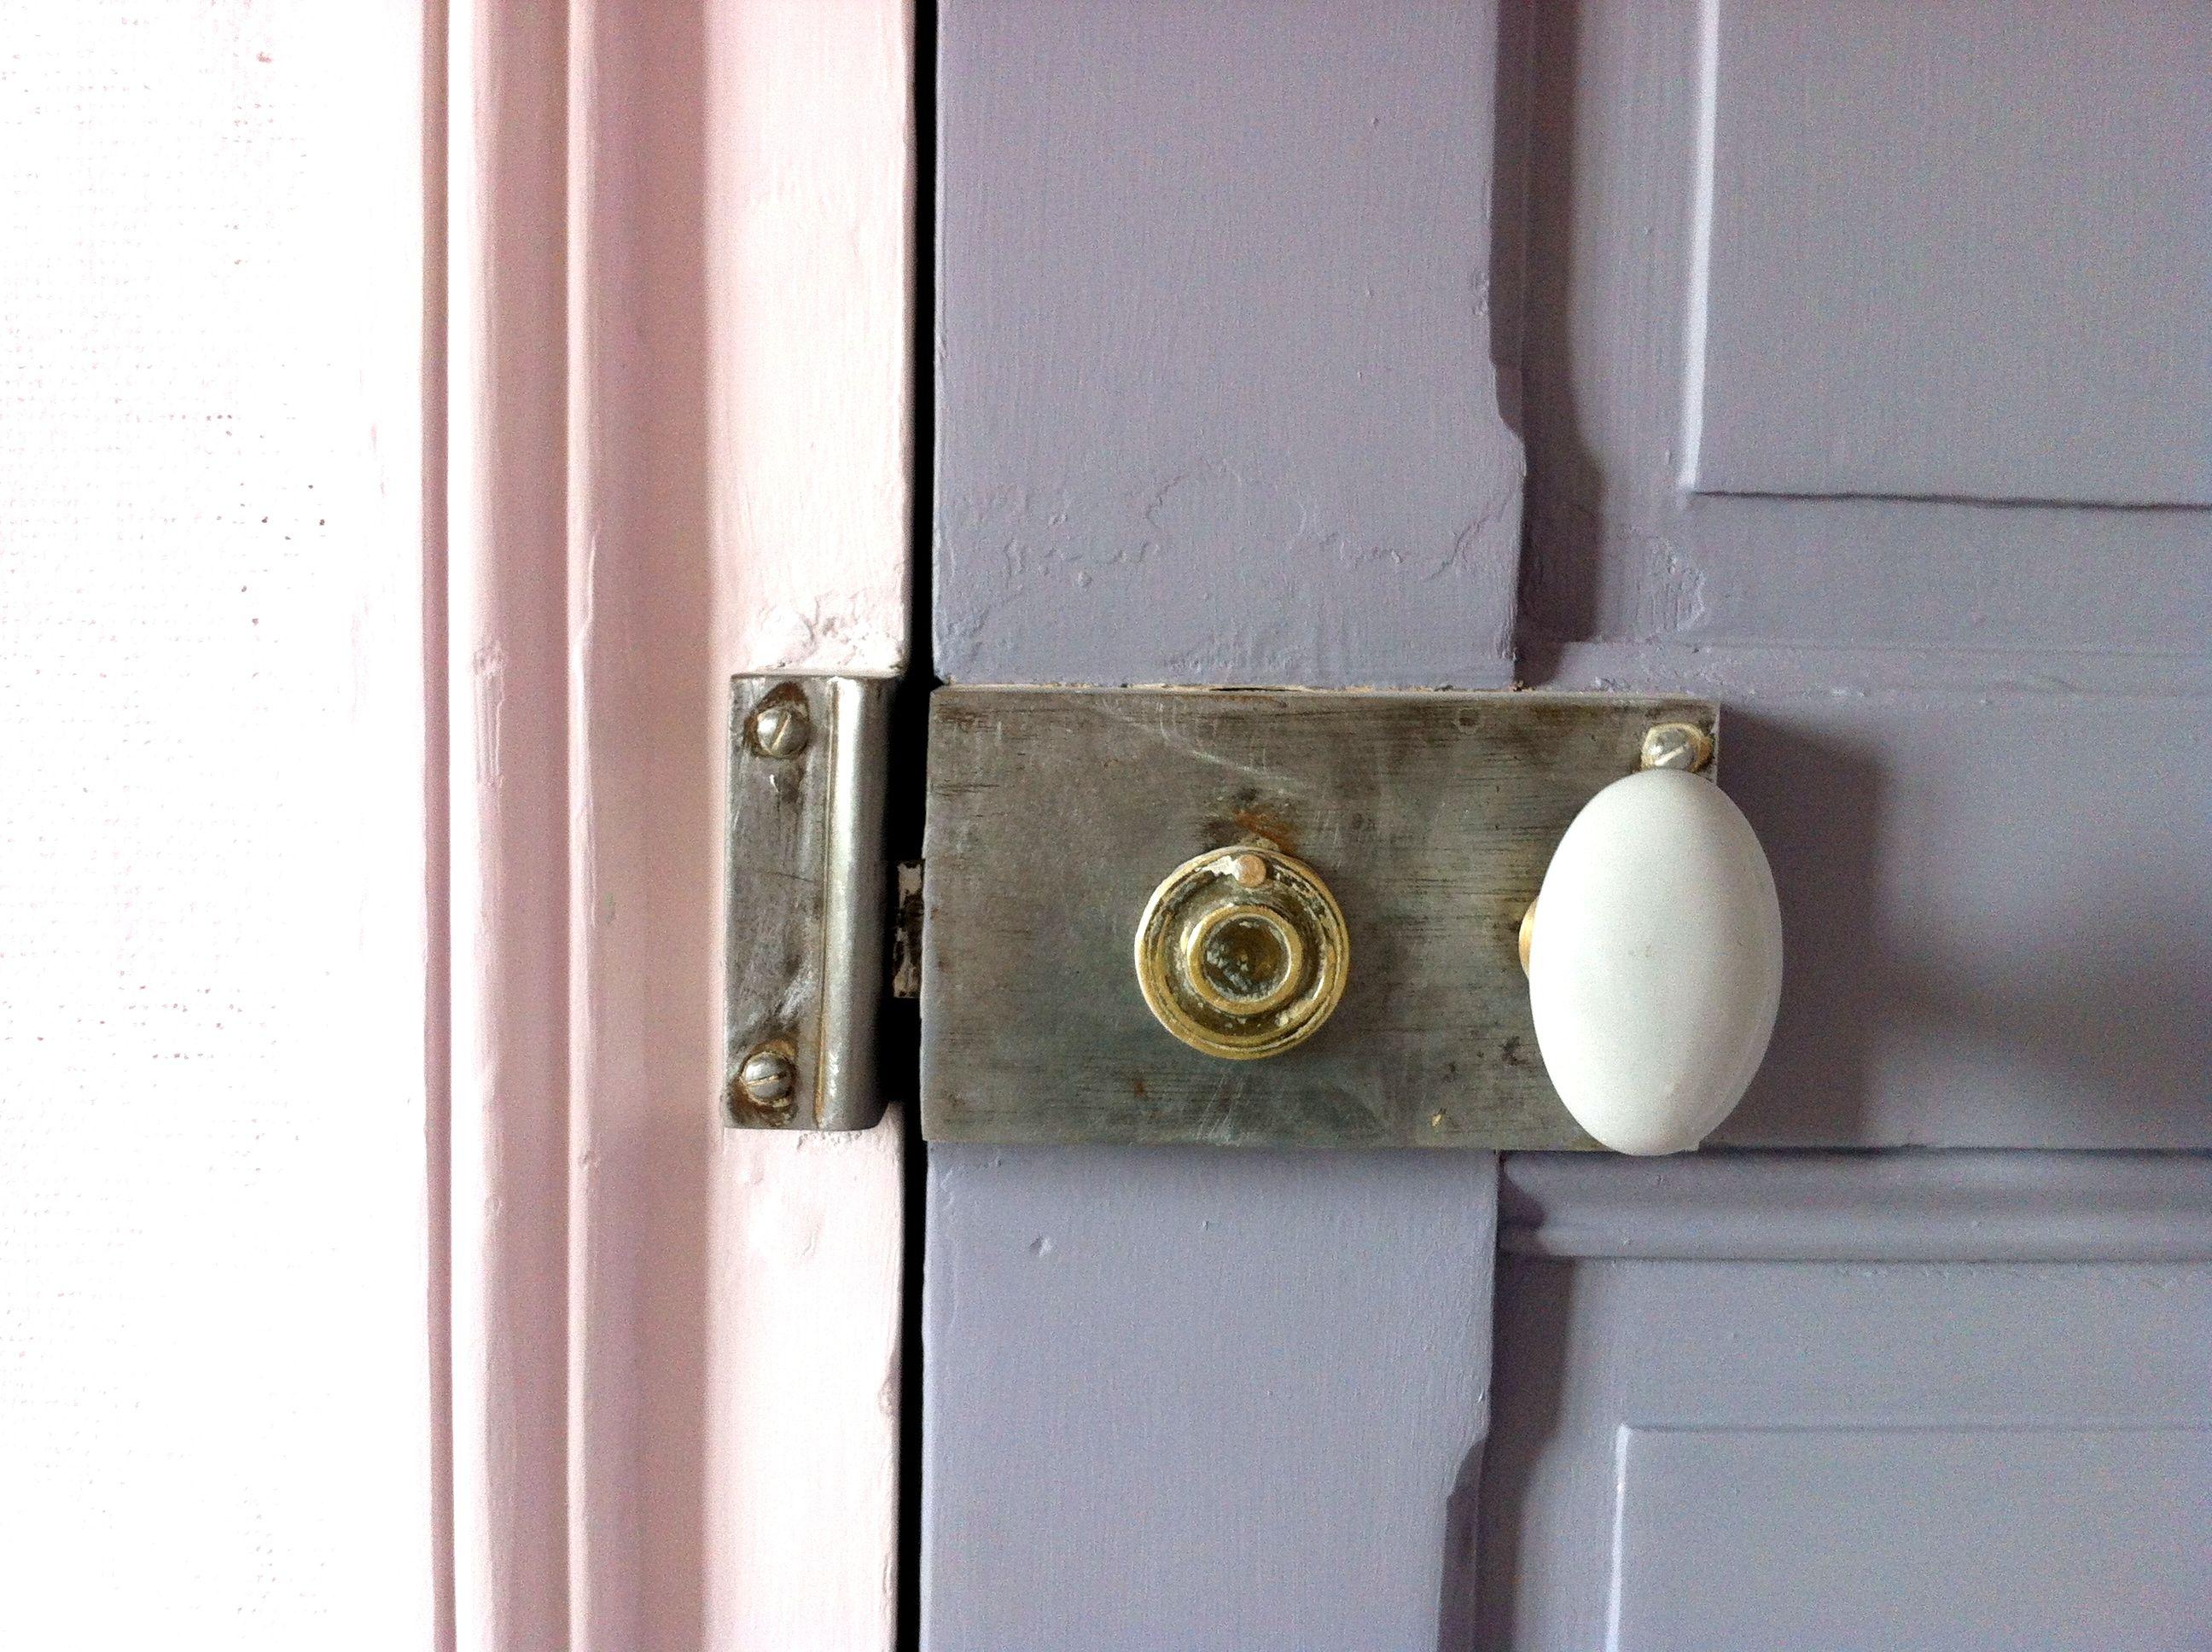 Chambre - Poignée De Porte Ancienne / Bedroom - Door Handle